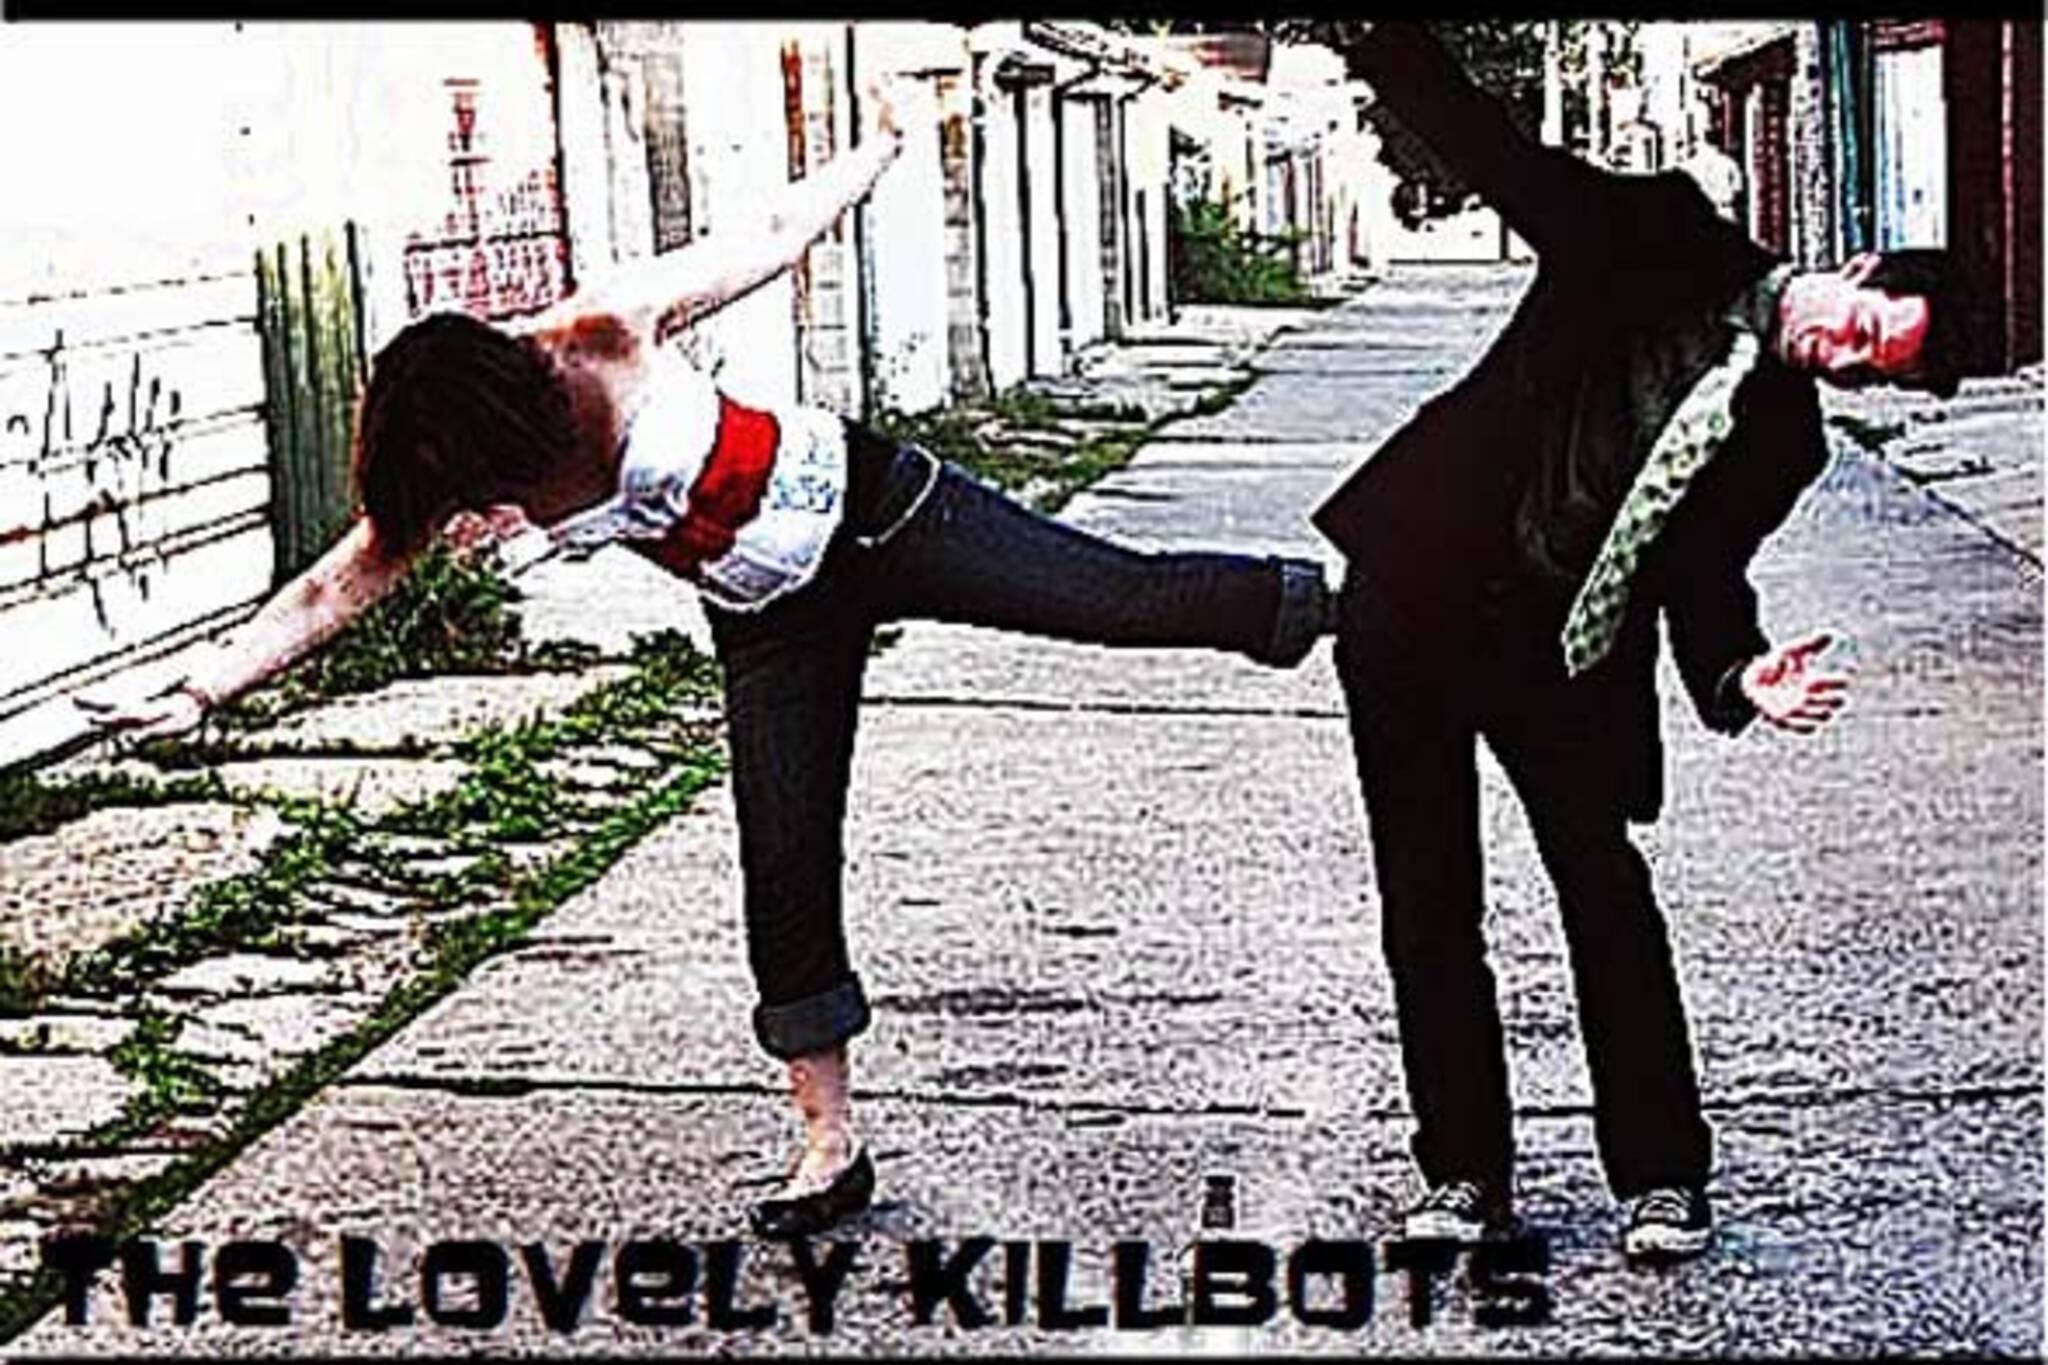 Lovely Killbots